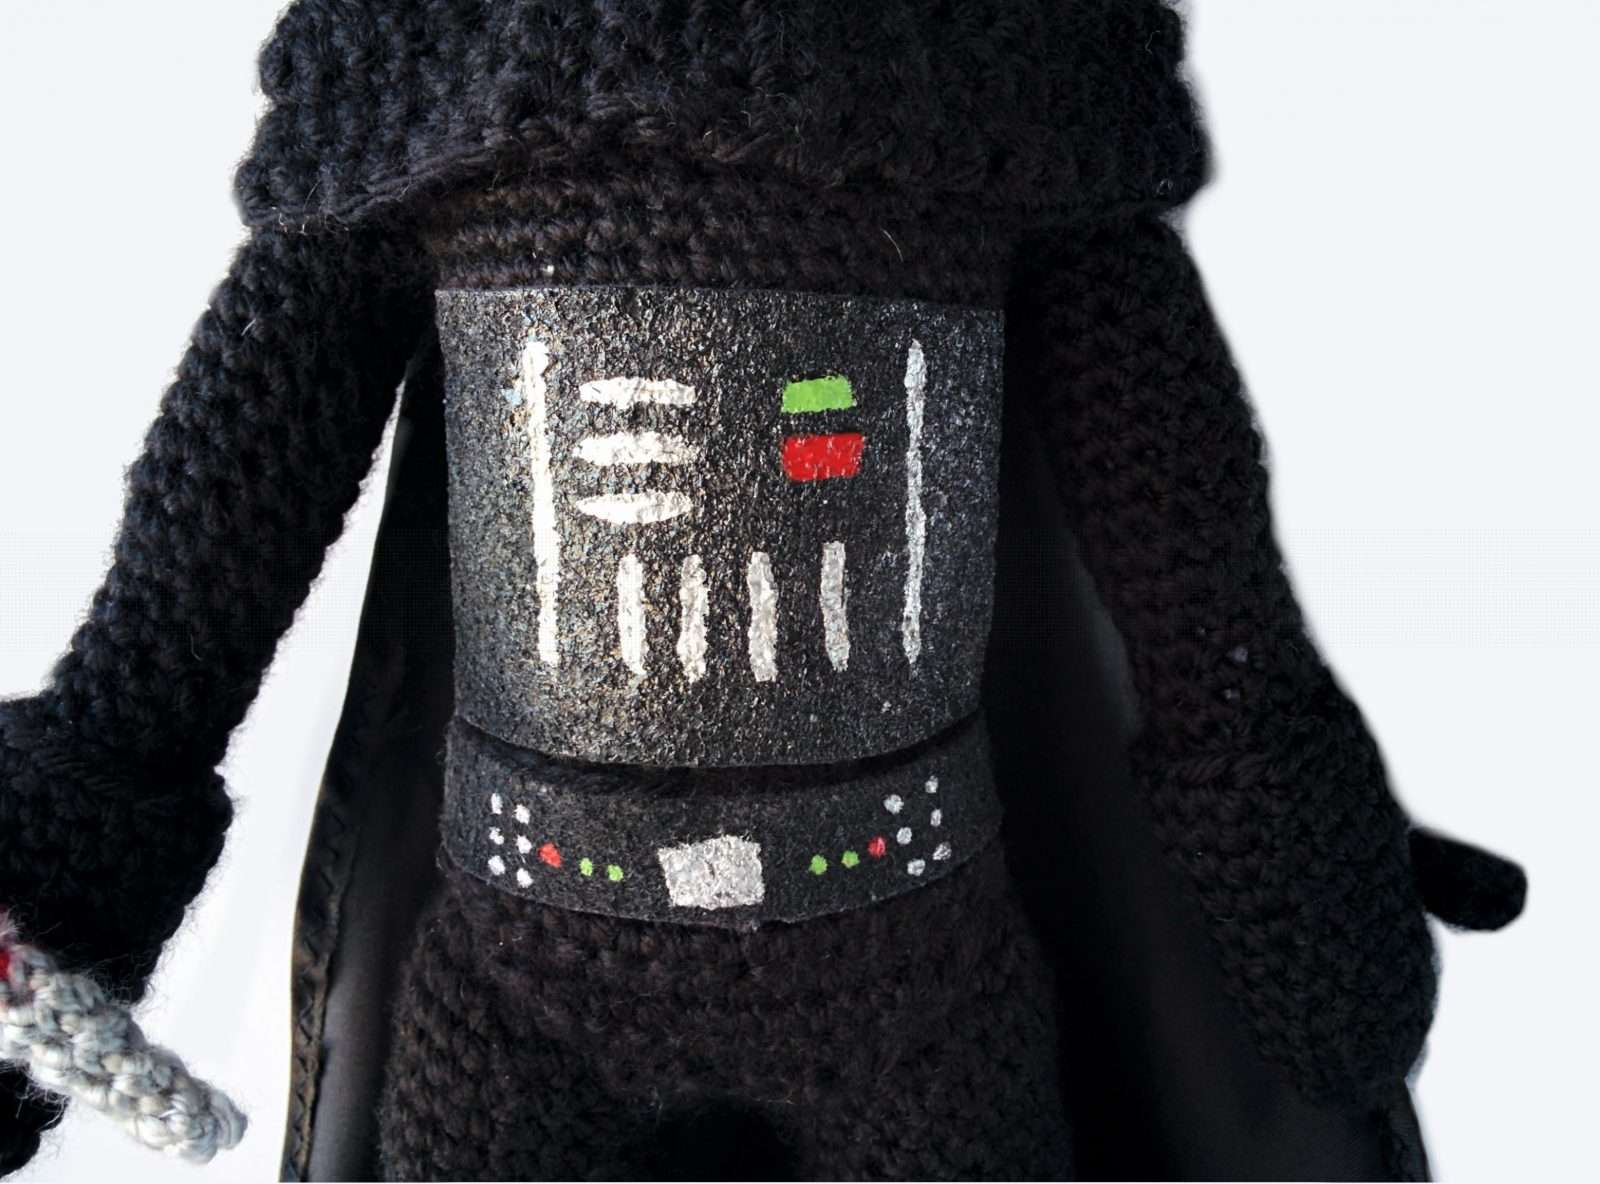 Darth Vader Amigurumi | Star wars crochet, Crochet amigurumi free ... | 1184x1600